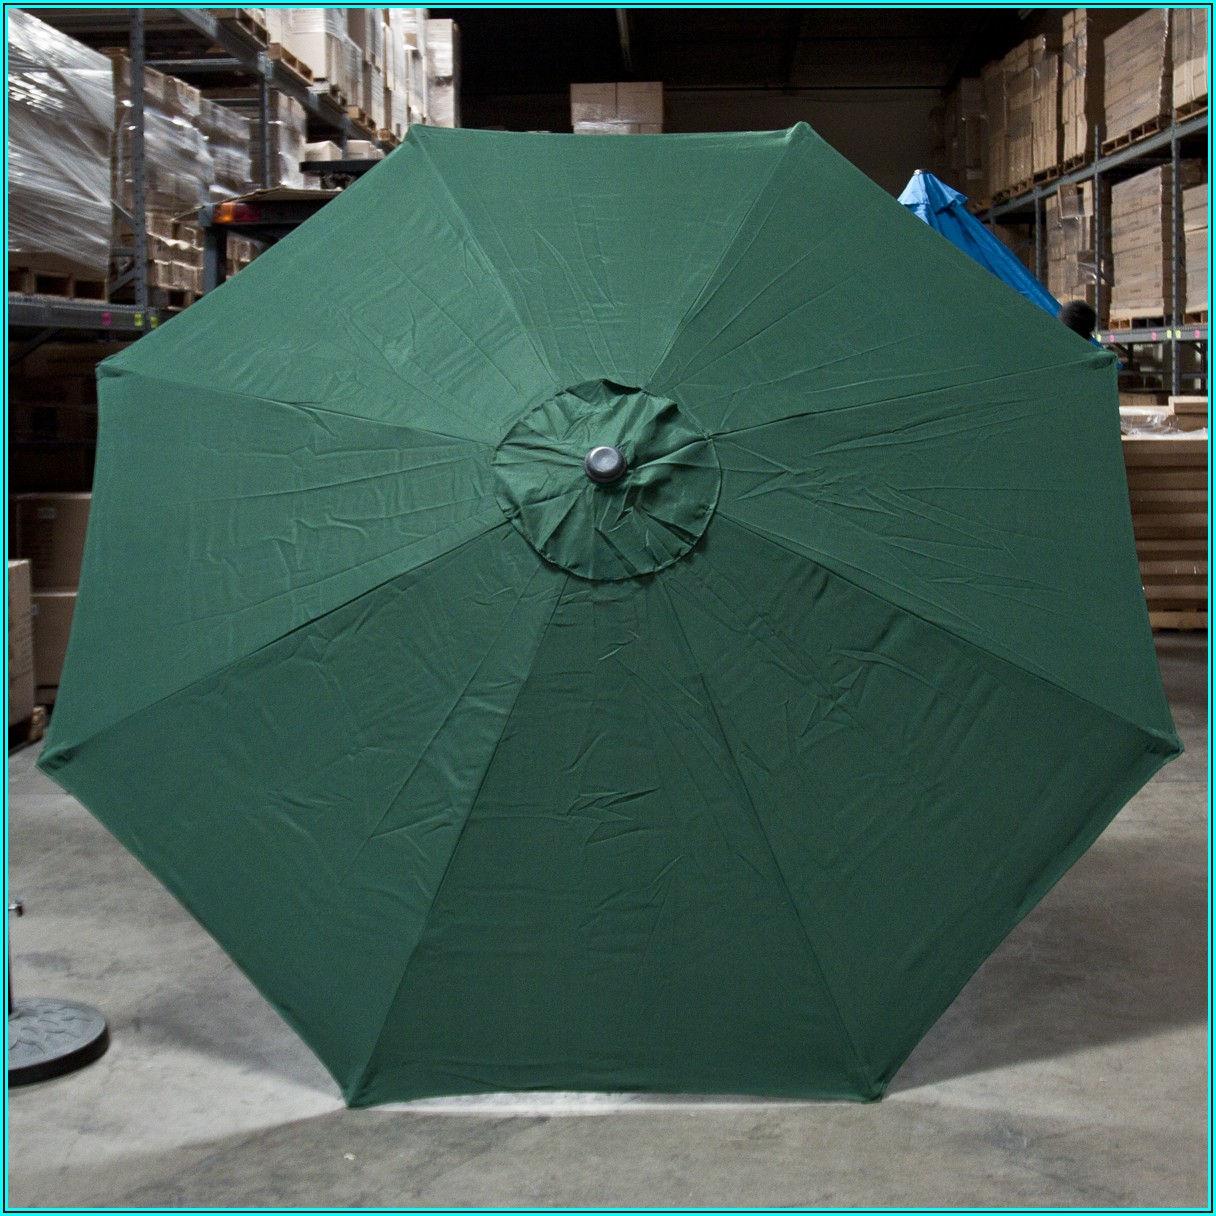 8 Foot Patio Umbrella Replacement Canopy